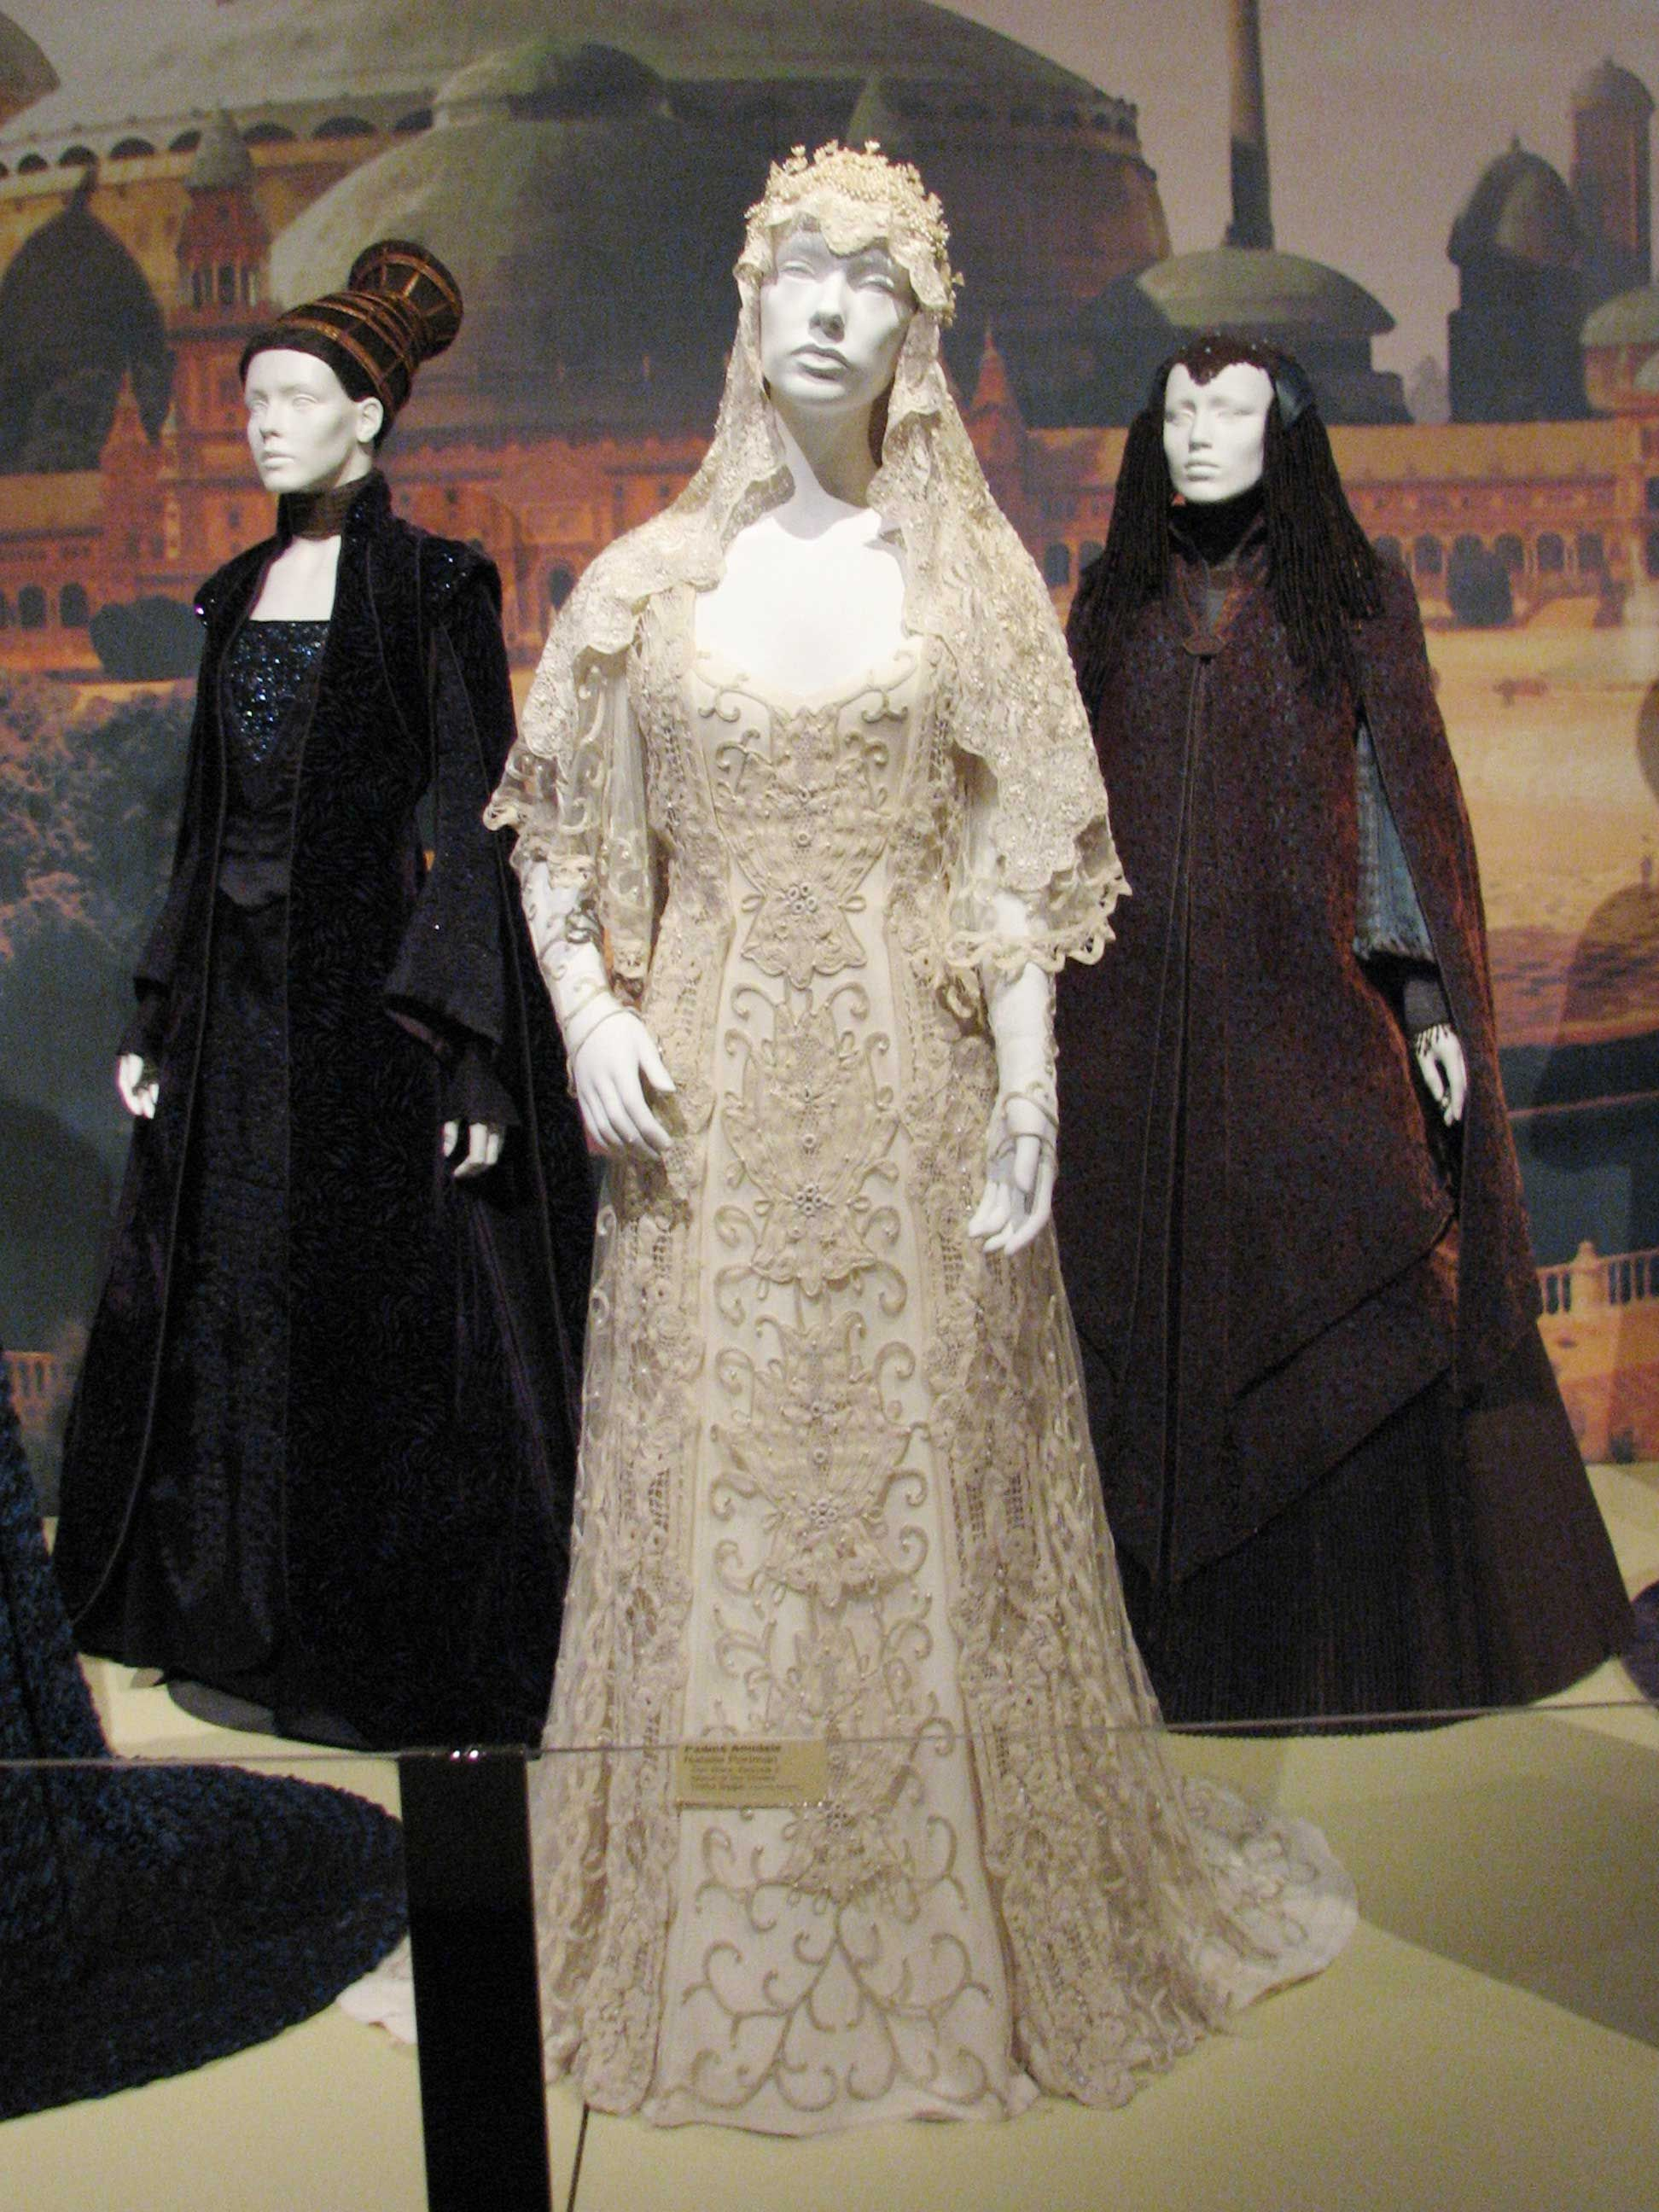 Star Wars - Wedding Dress | Wishing hoping planning dreaming ...